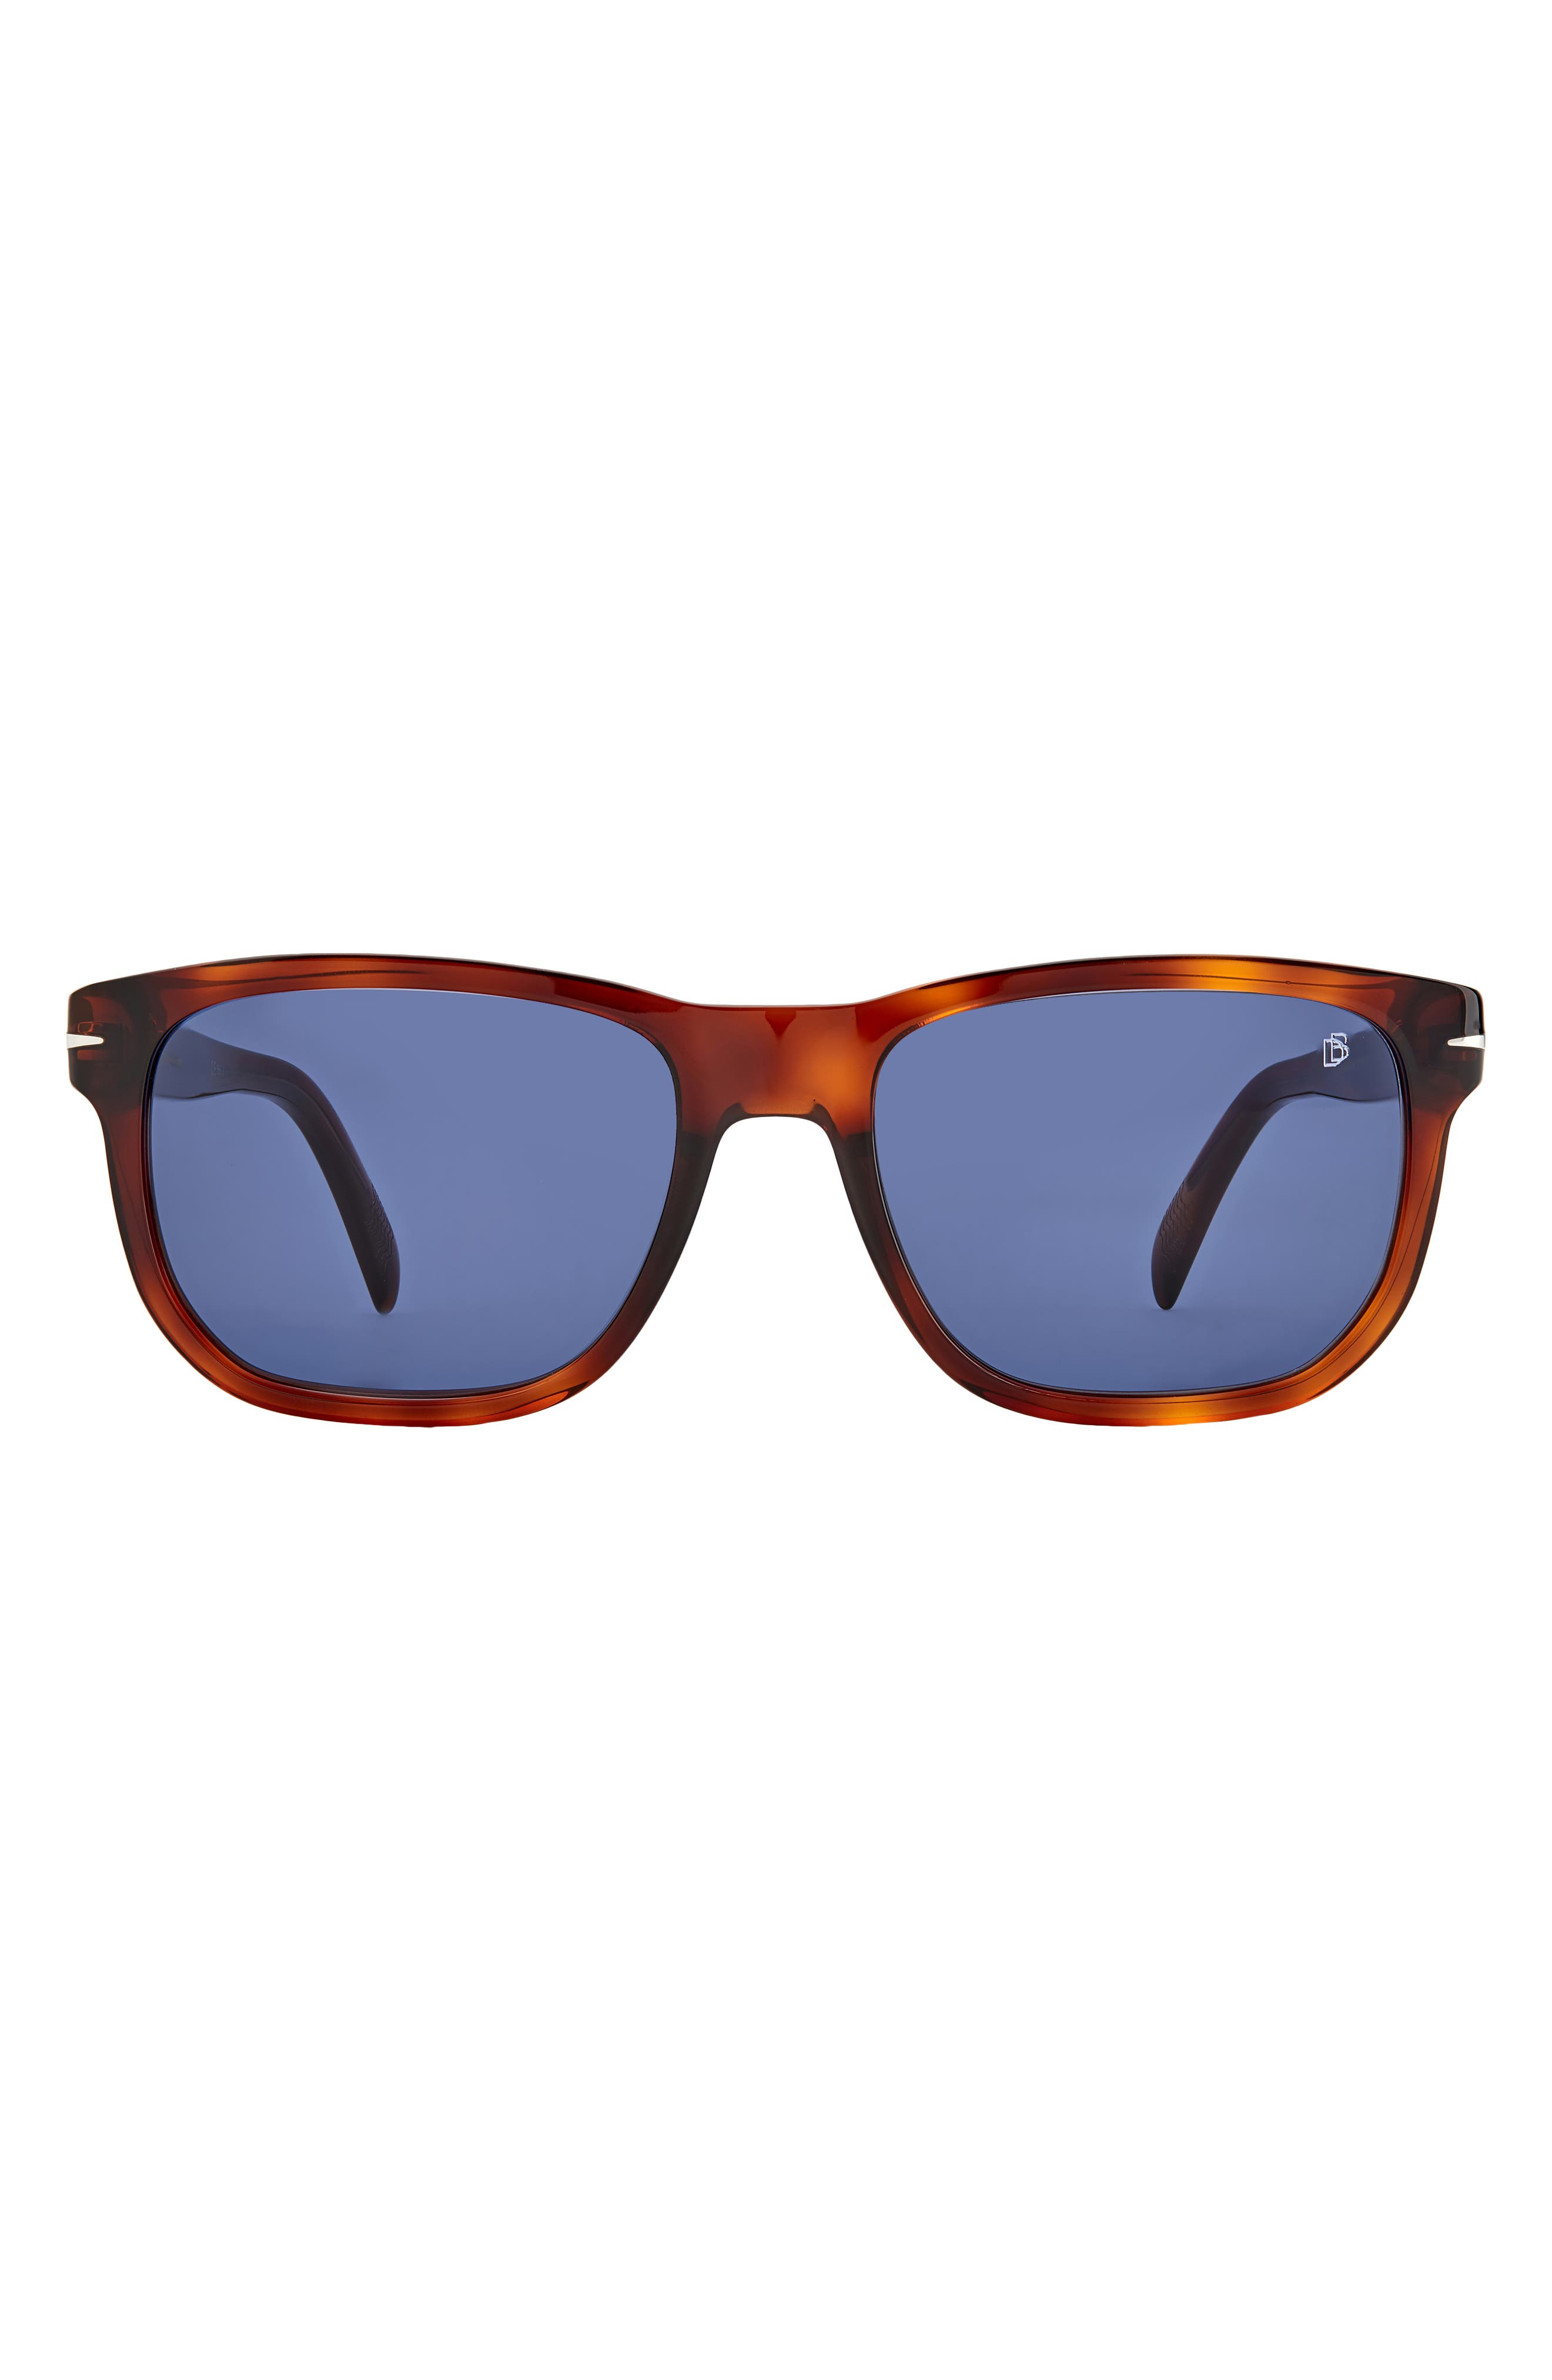 Men's David Beckham 54mm Rectangular Sunglasses